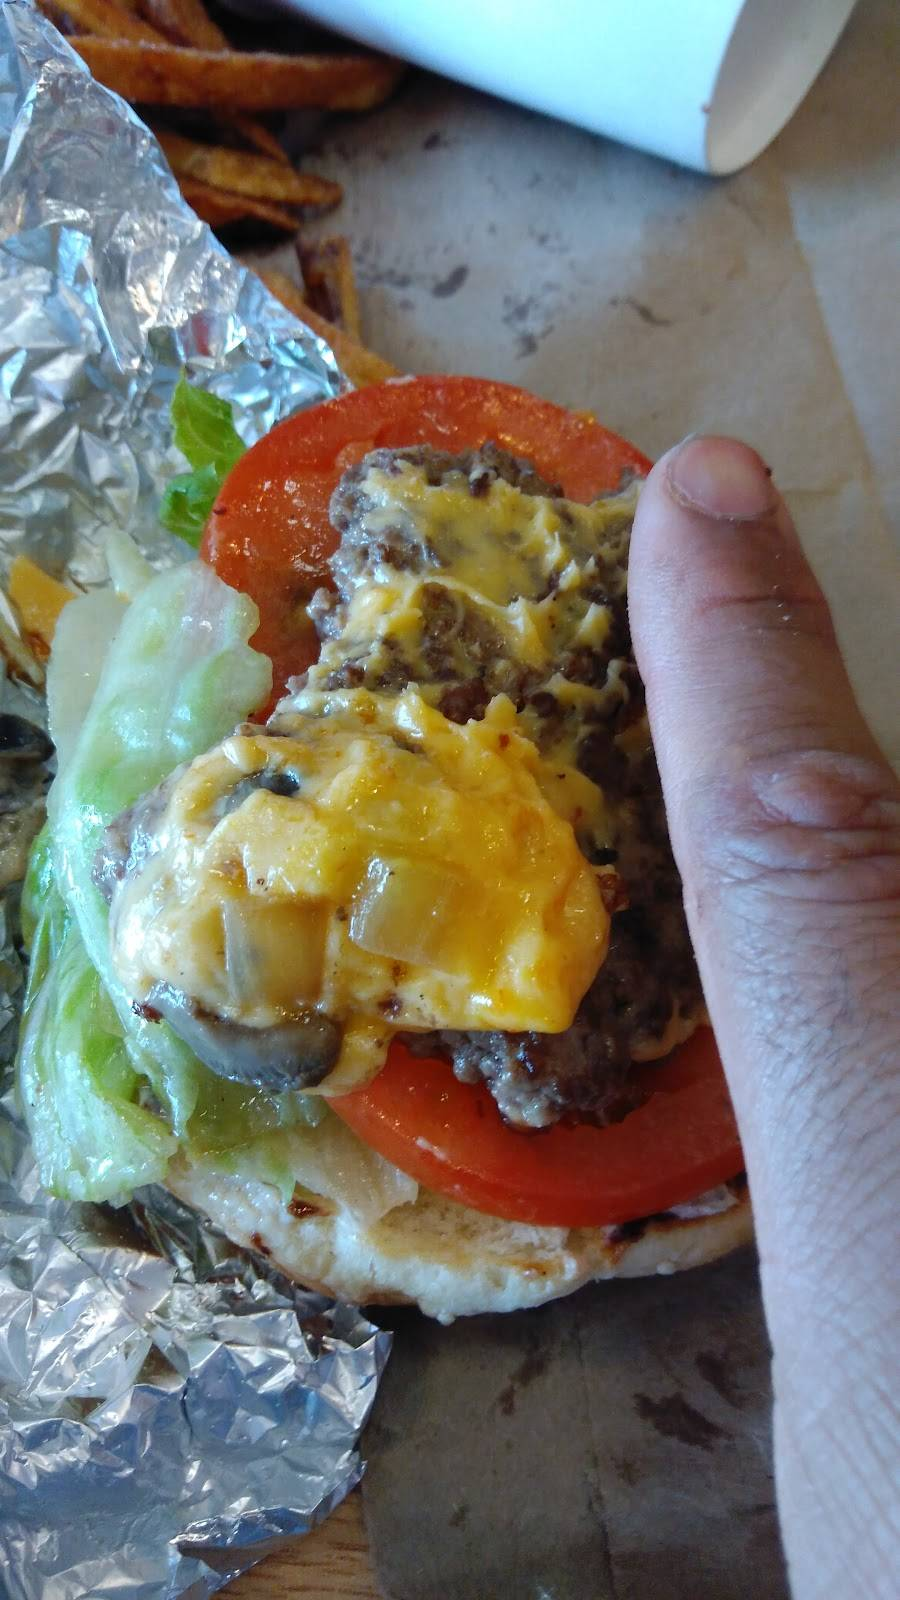 Five Guys   meal takeaway   73-25 Woodhaven Blvd, Ridgewood, NY 11385, USA   7189433483 OR +1 718-943-3483